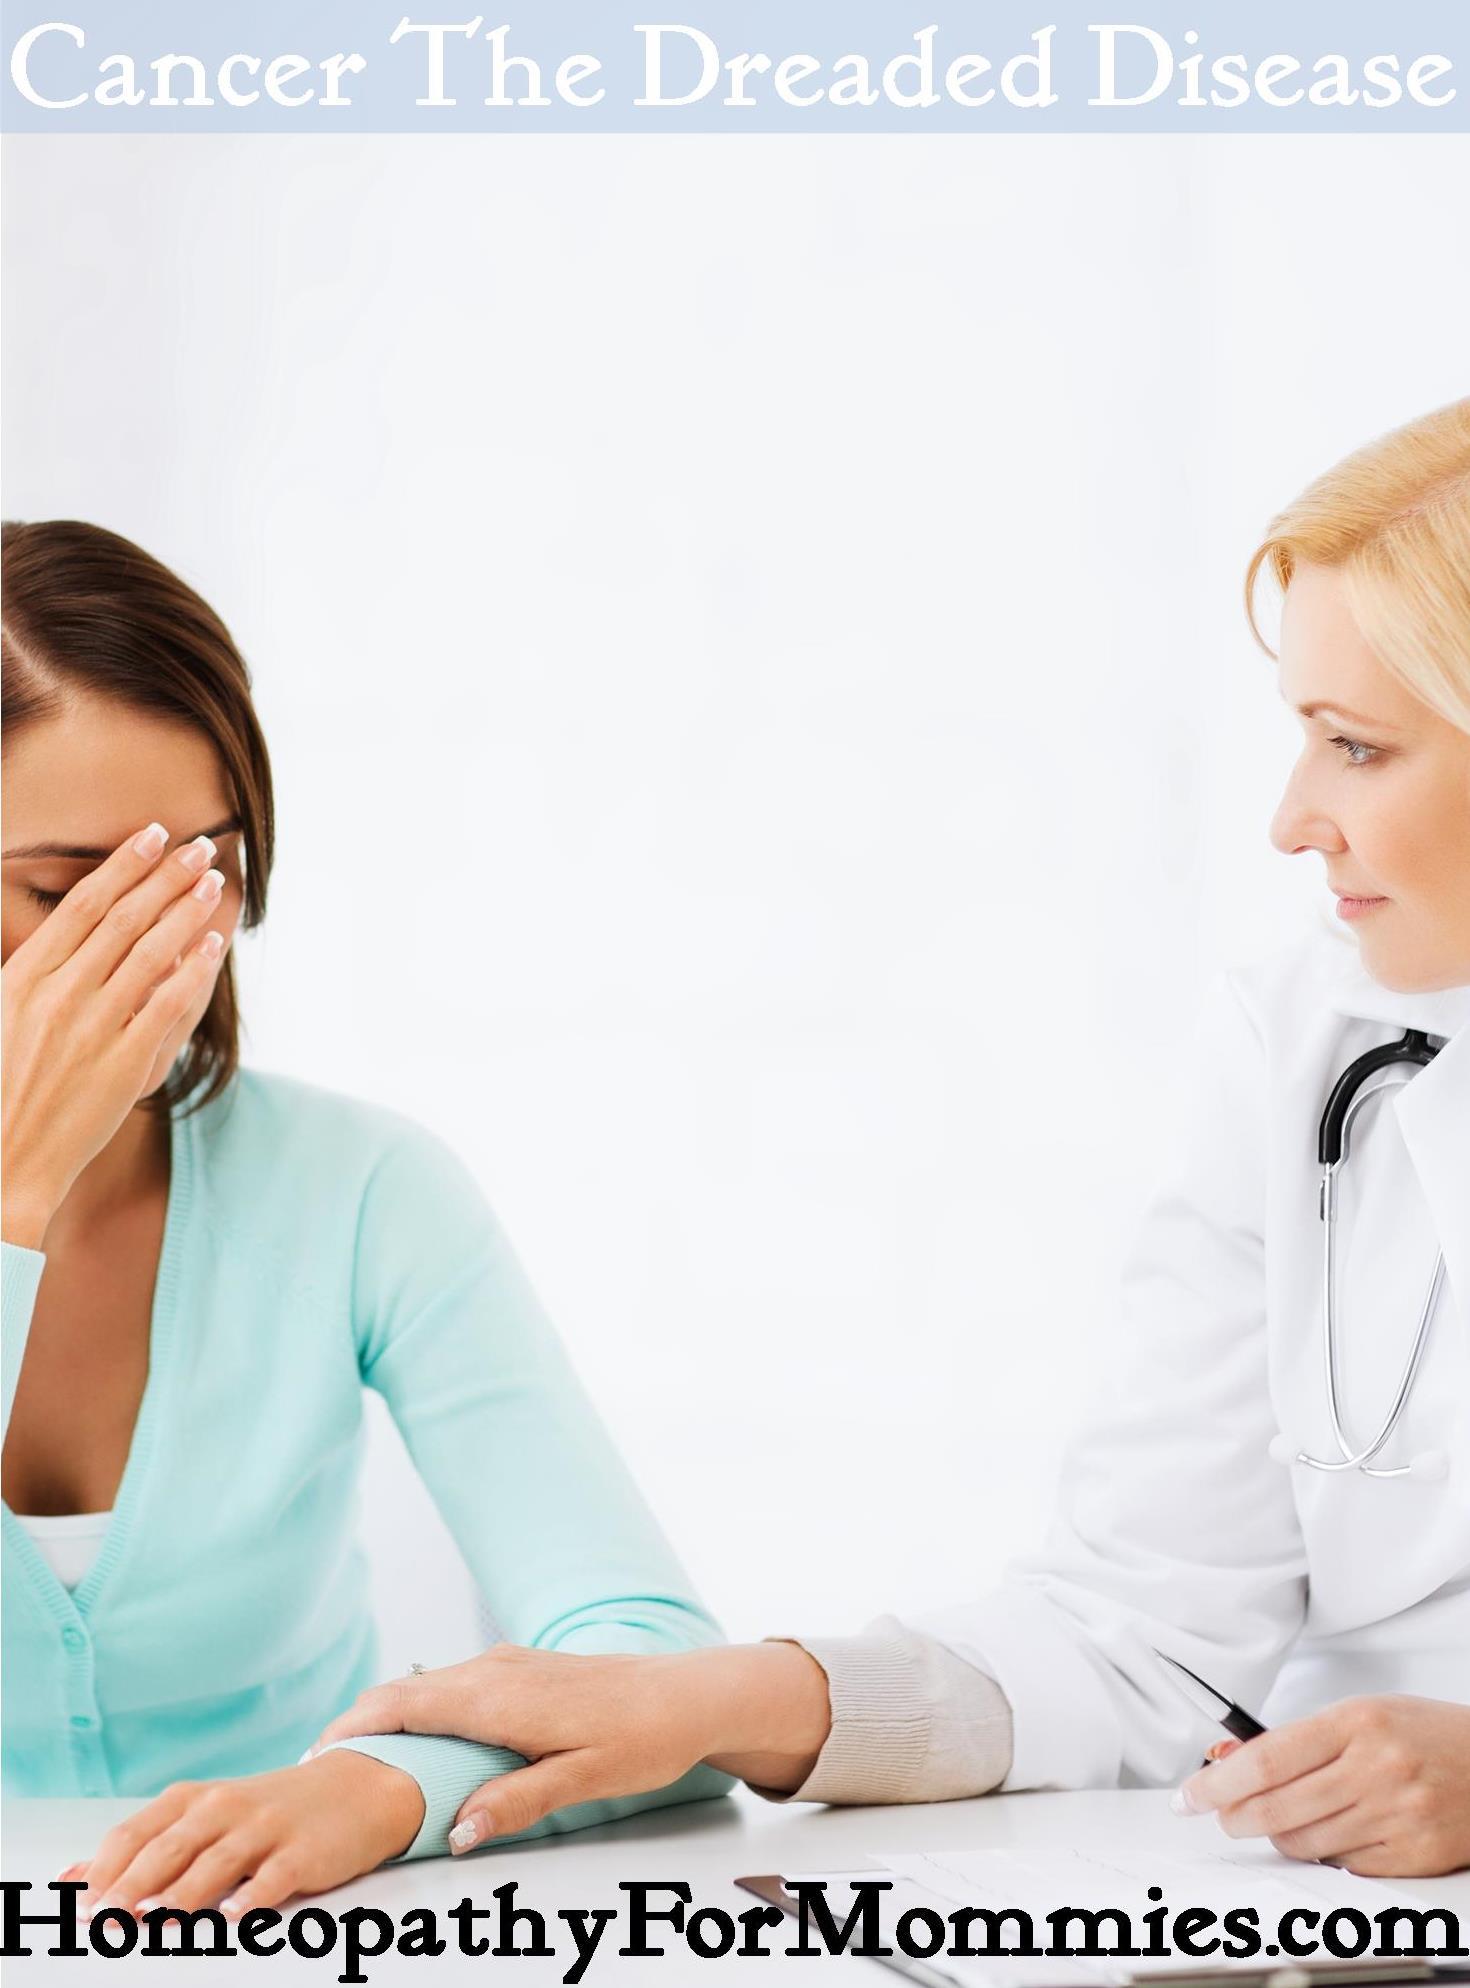 cancer the dreaded disease